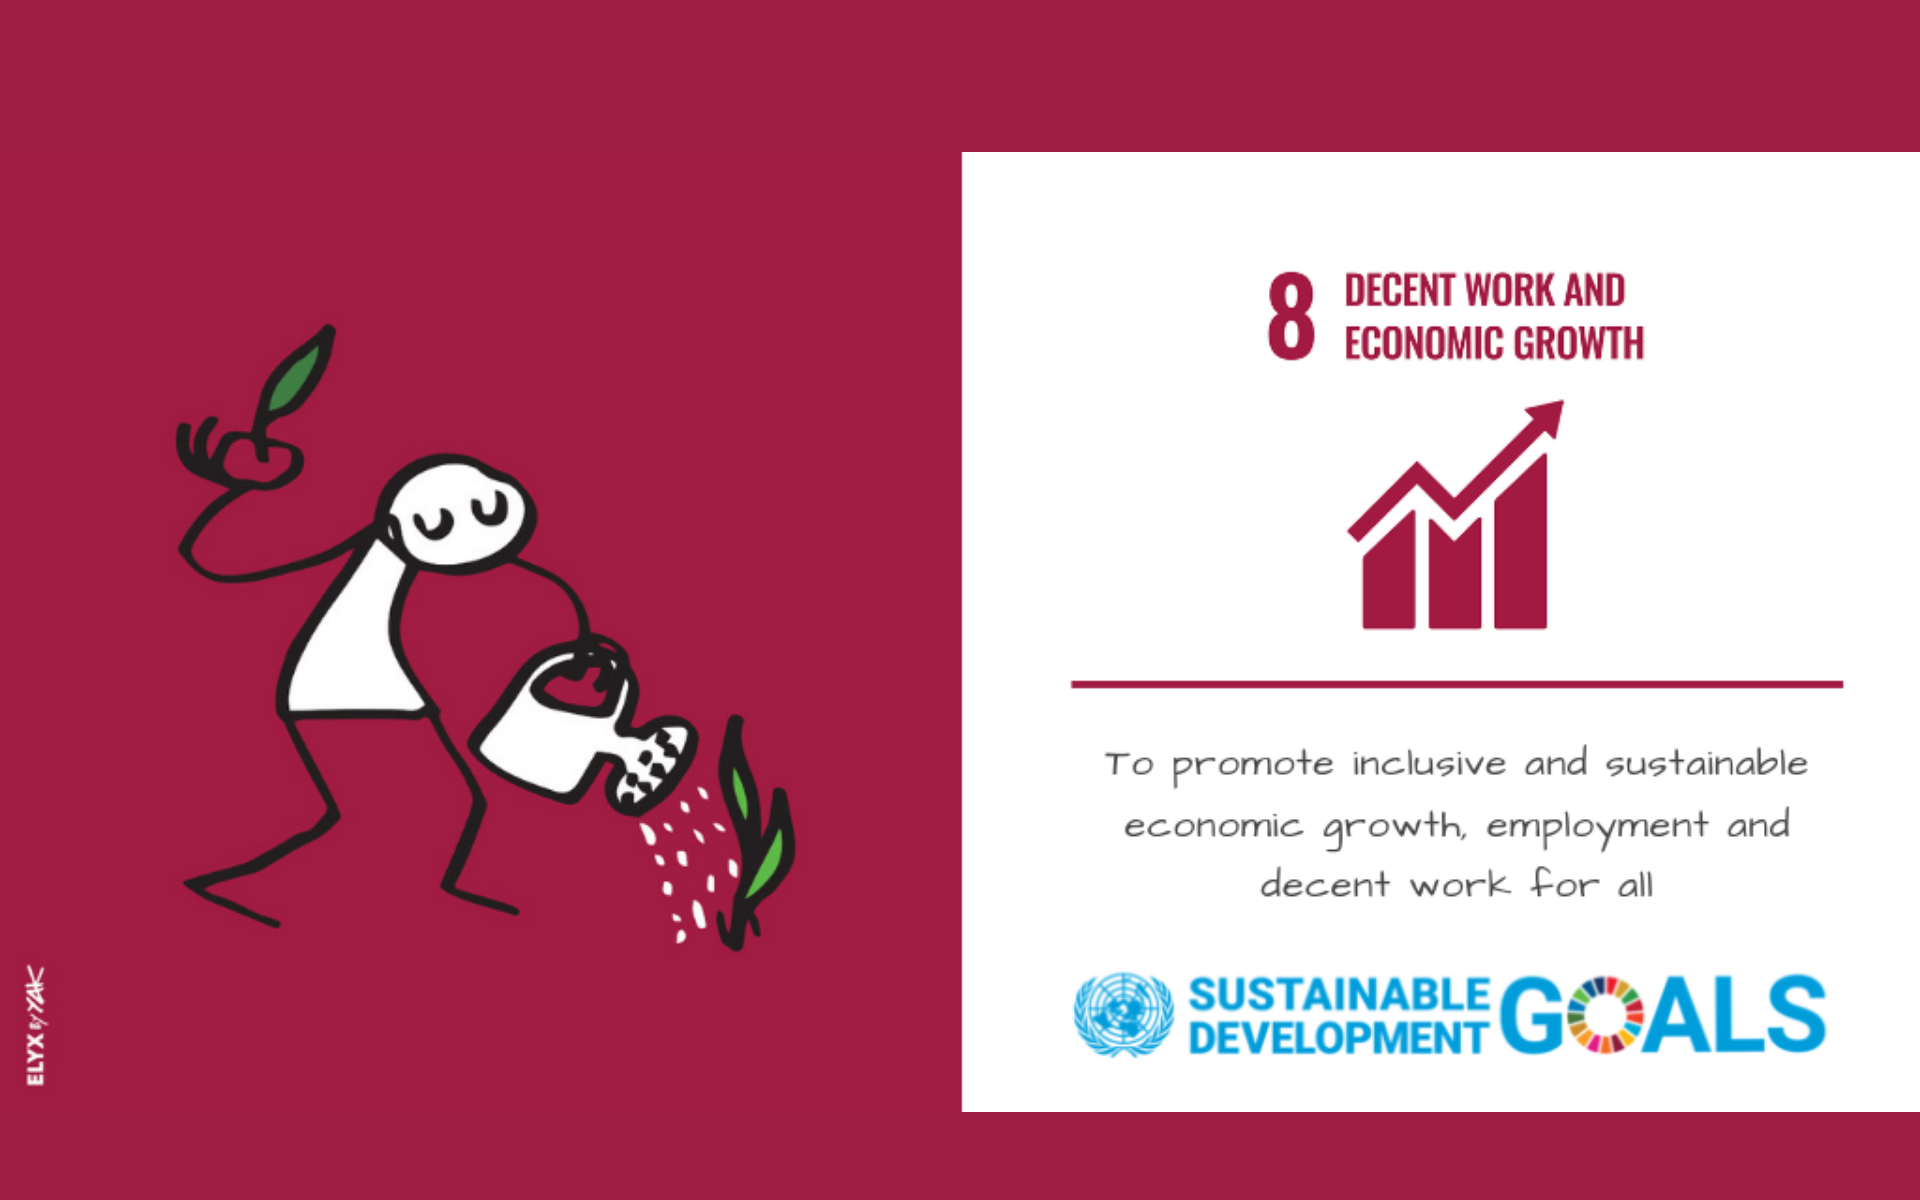 Sustainable Development Goal 8